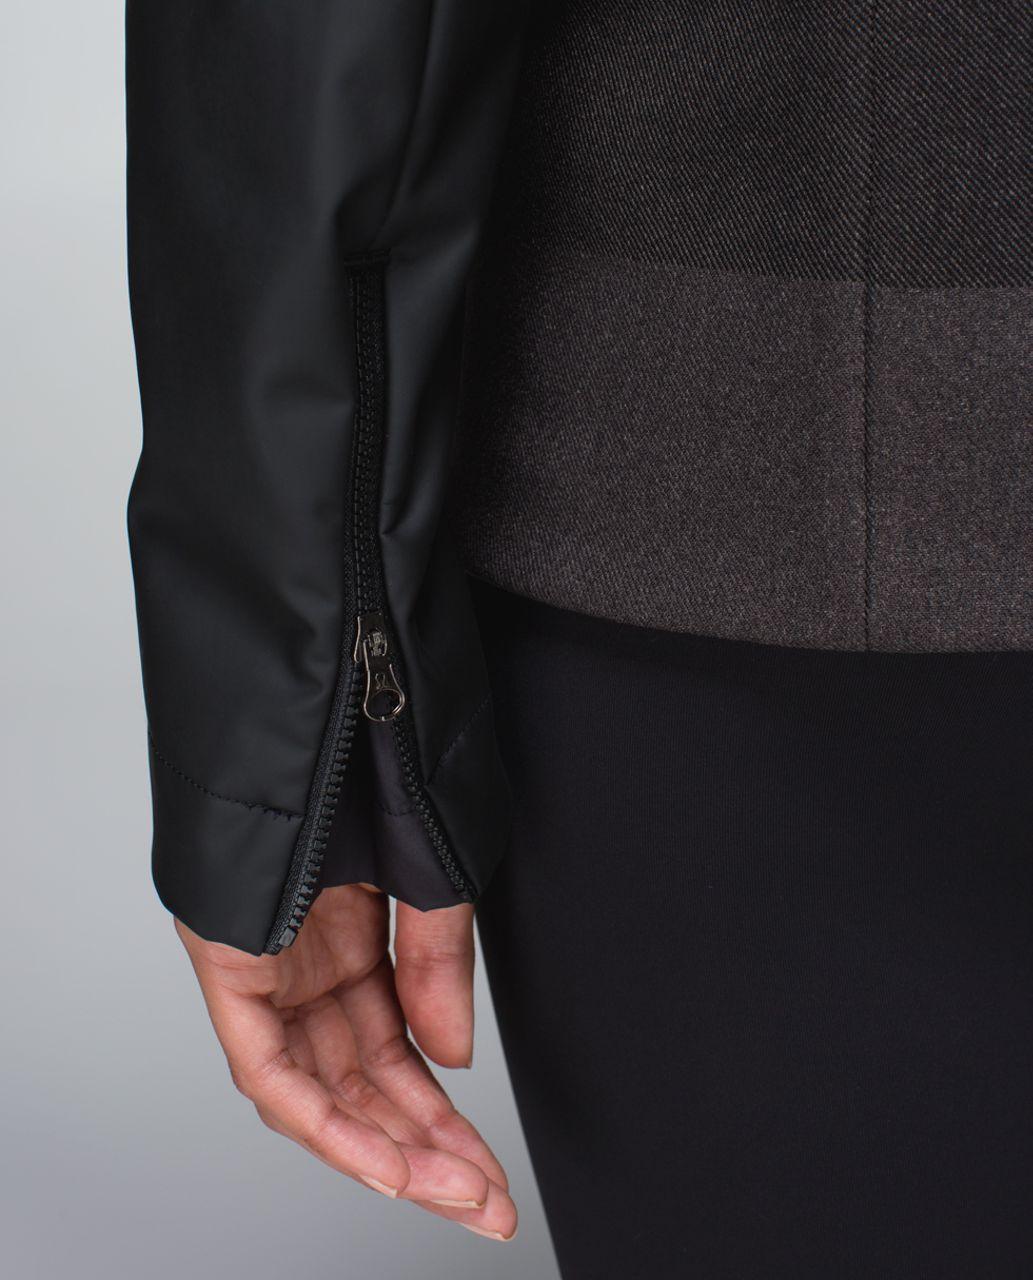 Lululemon Brisky Biker Jacket - Black / Horizontal Stripe Black Soot Light / Black